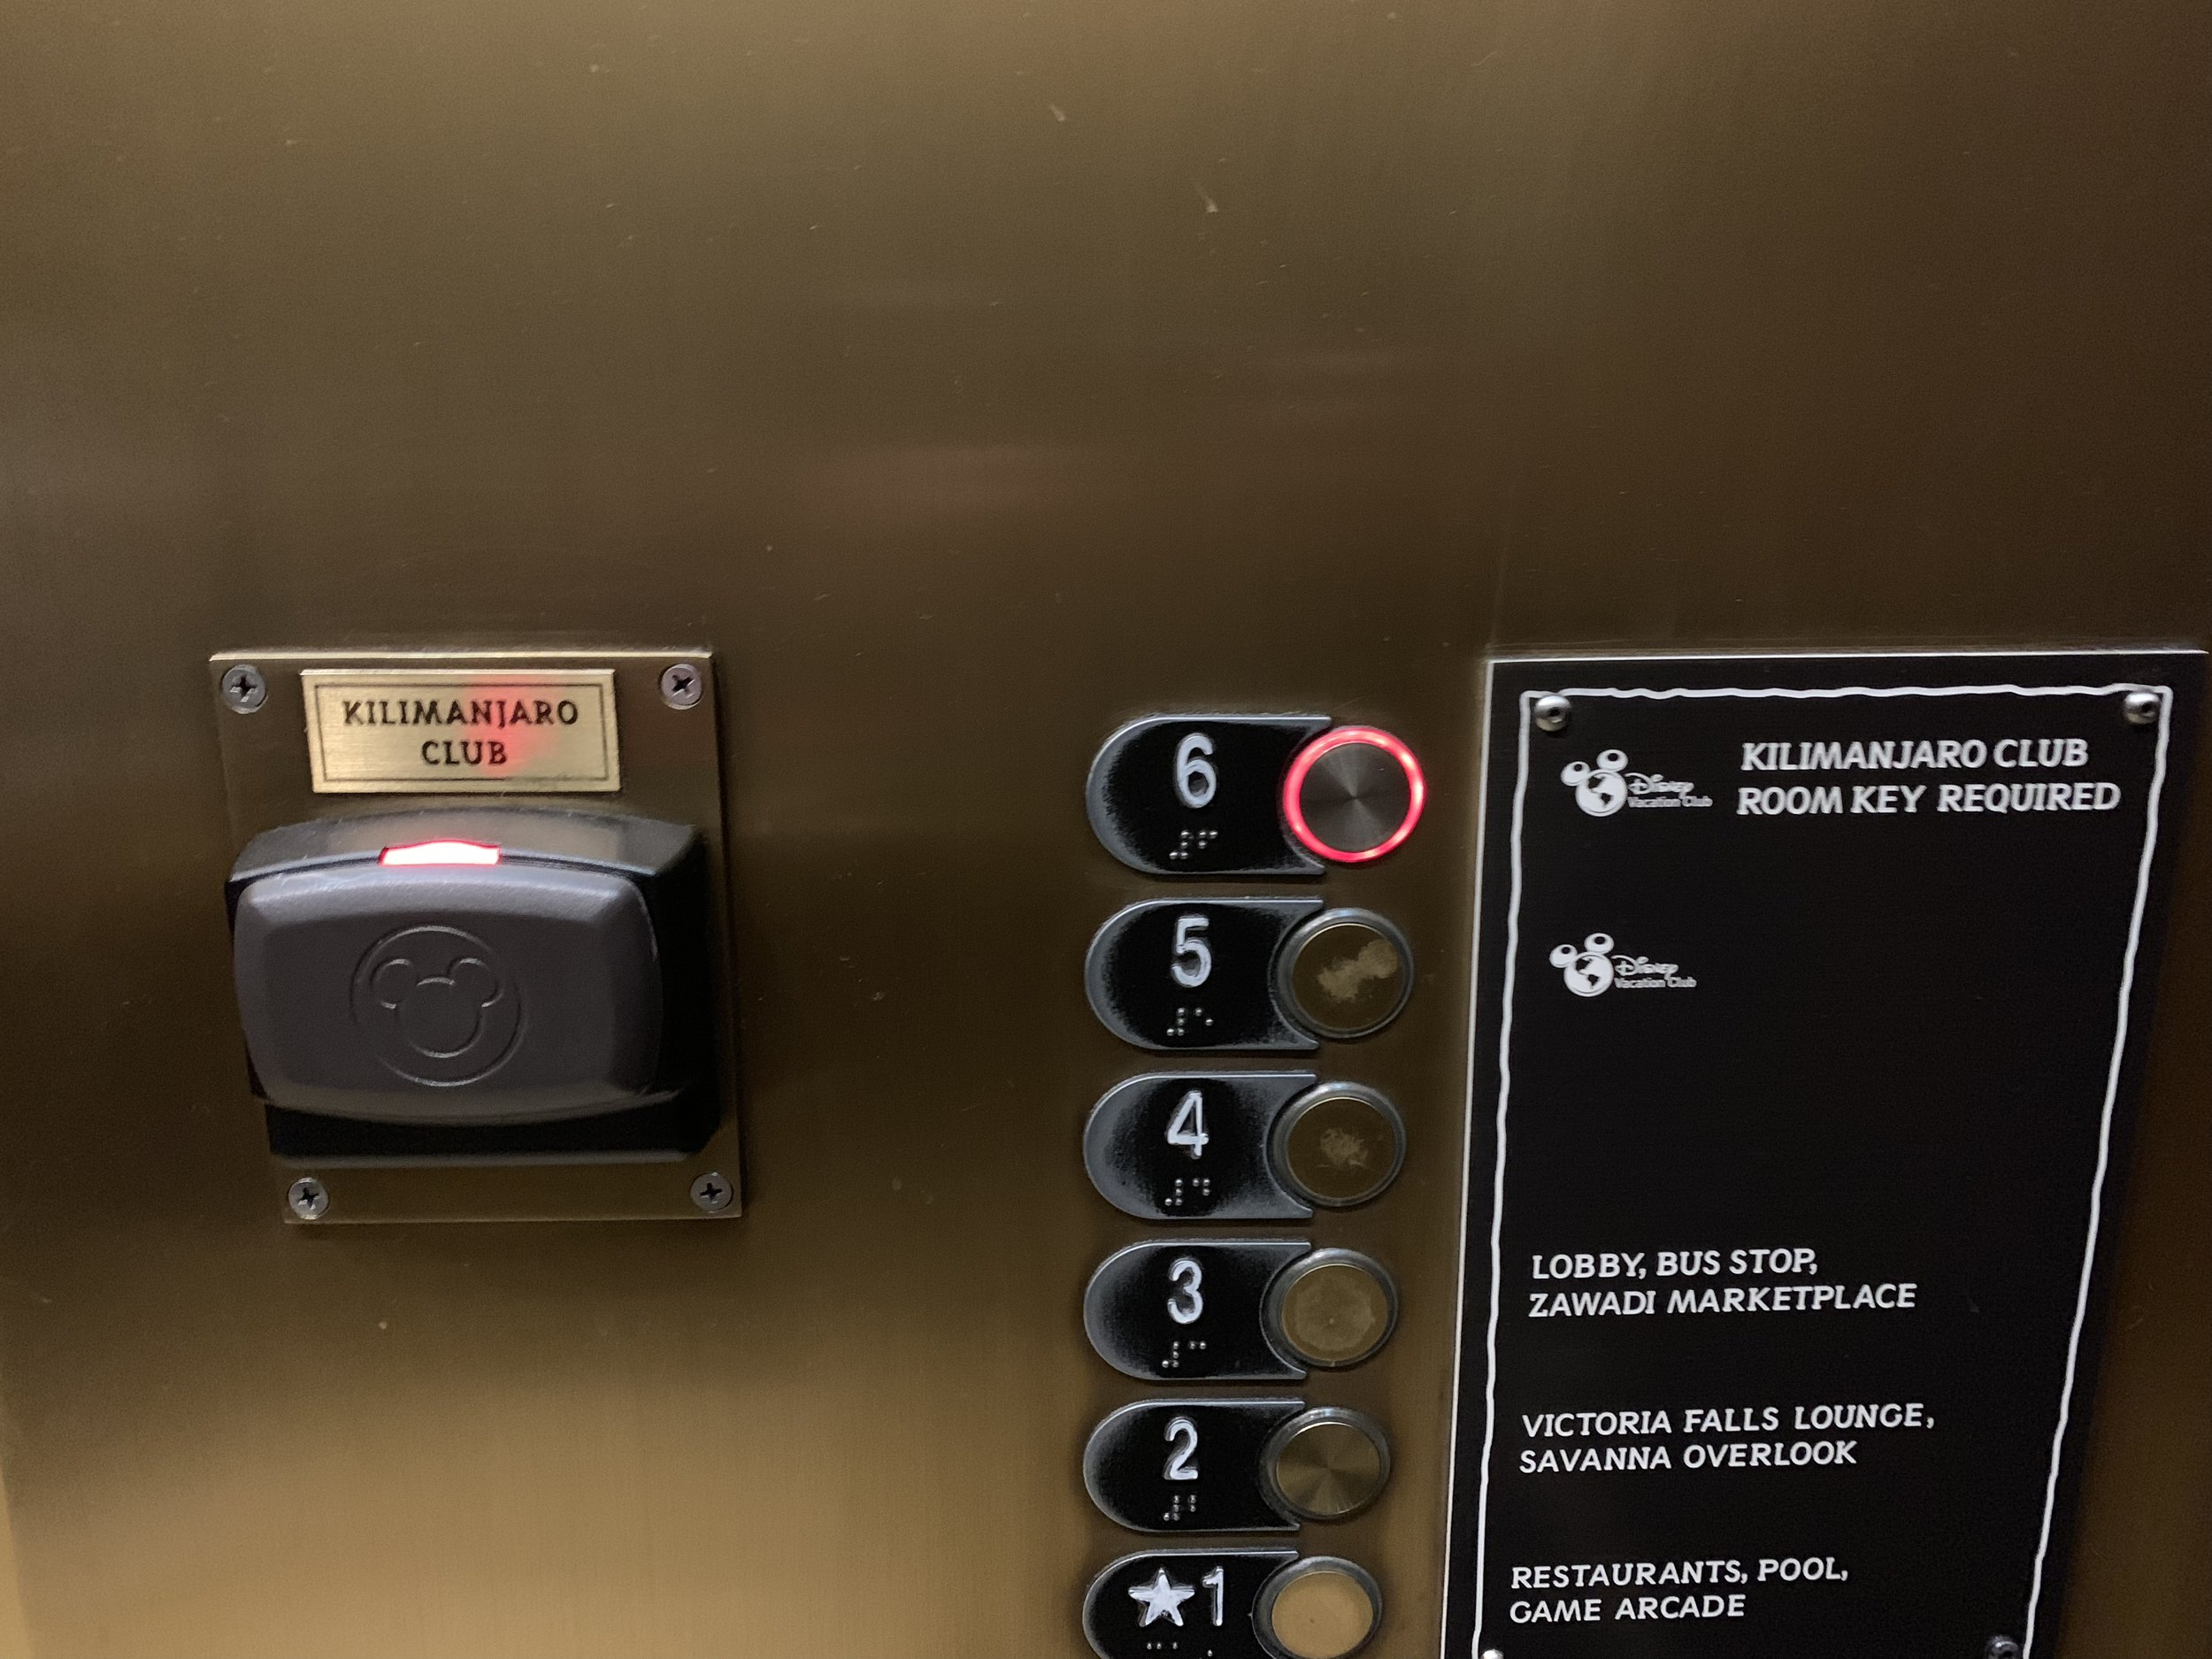 disney animal kingdom lodge kilimanjaro club level review elevator.jpg